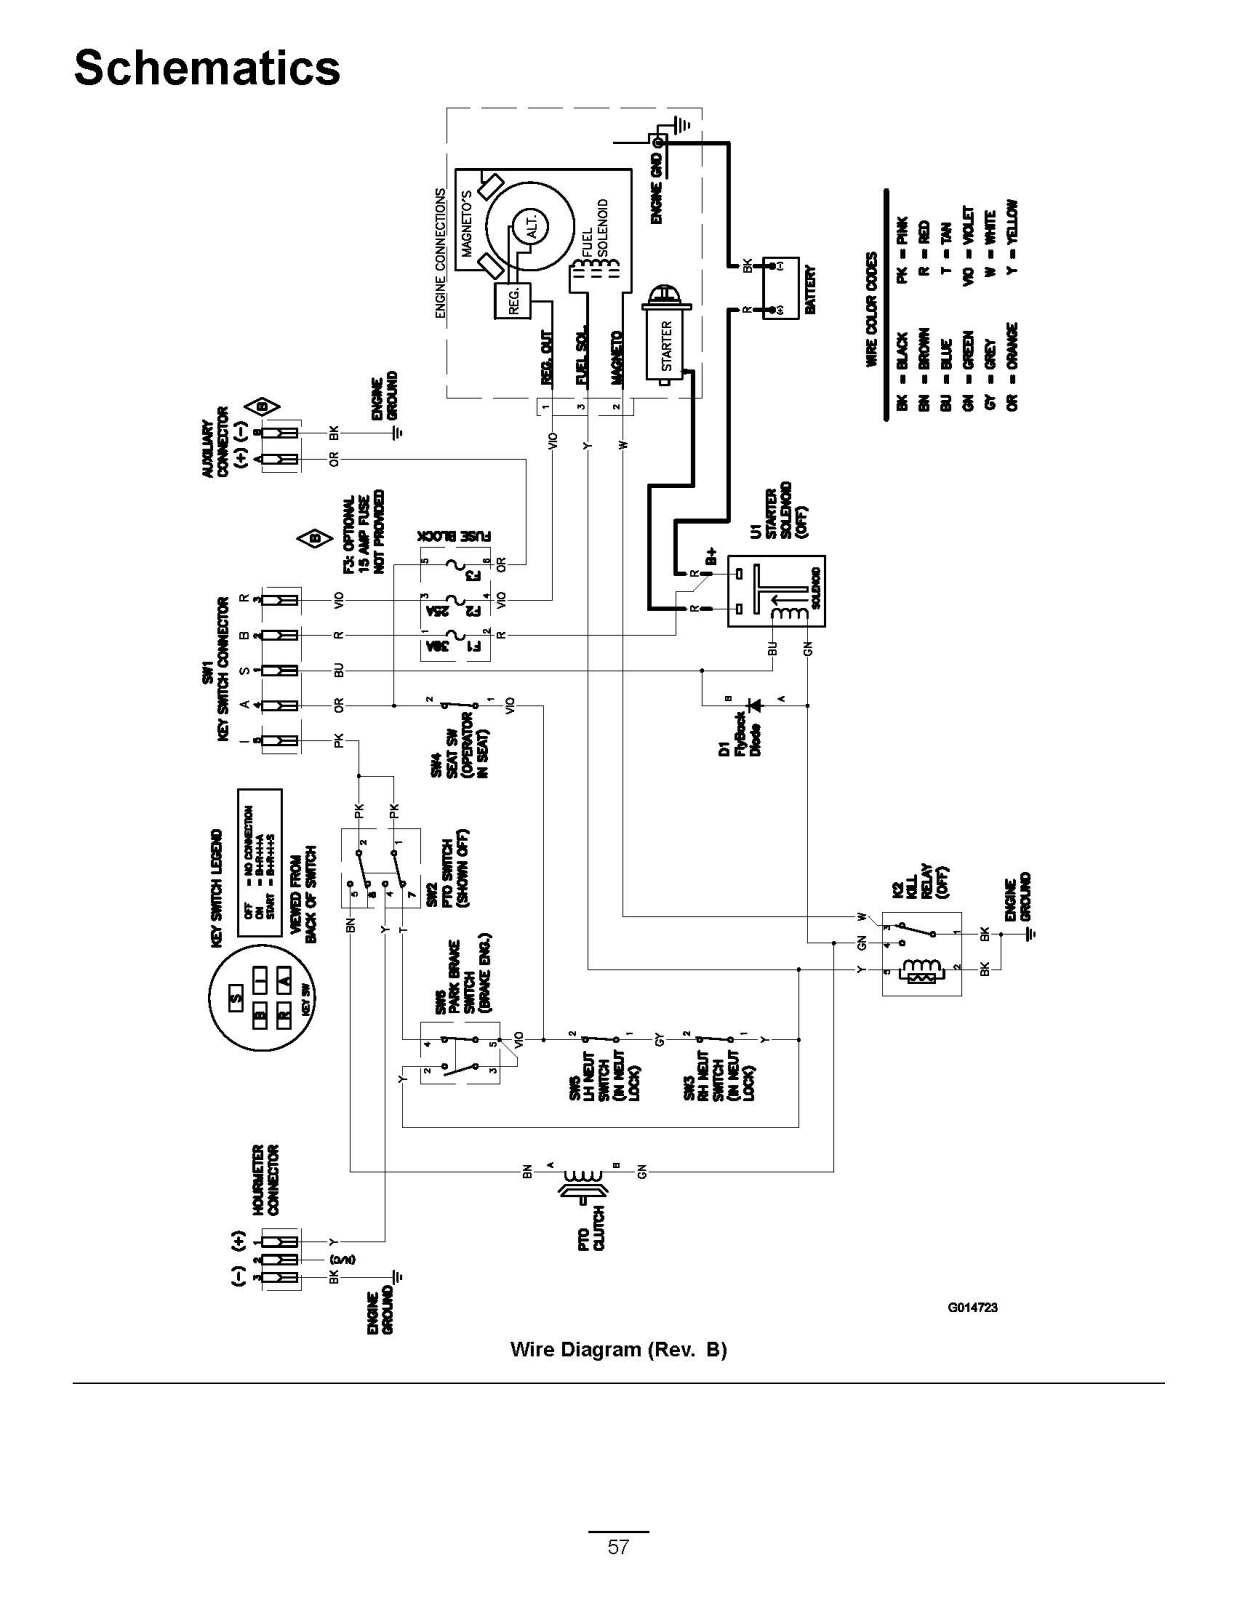 Toro Zero Turn Wiring Diagram - 7.cotsamzp.timmarshall.info •  Way Trailer Plug Wiring Diagram Contrail on 7 pronge trailer connector diagram, 7-wire rv plug diagram, seven way trailer wiring diagram, 7-way connector wiring diagram, 7-way trailer light diagram, ford trailer brake controller wiring diagram, 7 way trailer plug dimensions, 7 way trailer hitch wiring diagram, horse trailer wiring diagram, phillips 7-way wiring diagram, 7 way trailer plug cover, 7-way blade wiring diagram, trailer light plug diagram, 7 way trailer plug ford, chevy 7-way trailer wiring diagram, 7 way trailer plug installation, seven wire trailer wiring diagram, 4 way trailer wiring diagram, seven way trailer plug diagram,